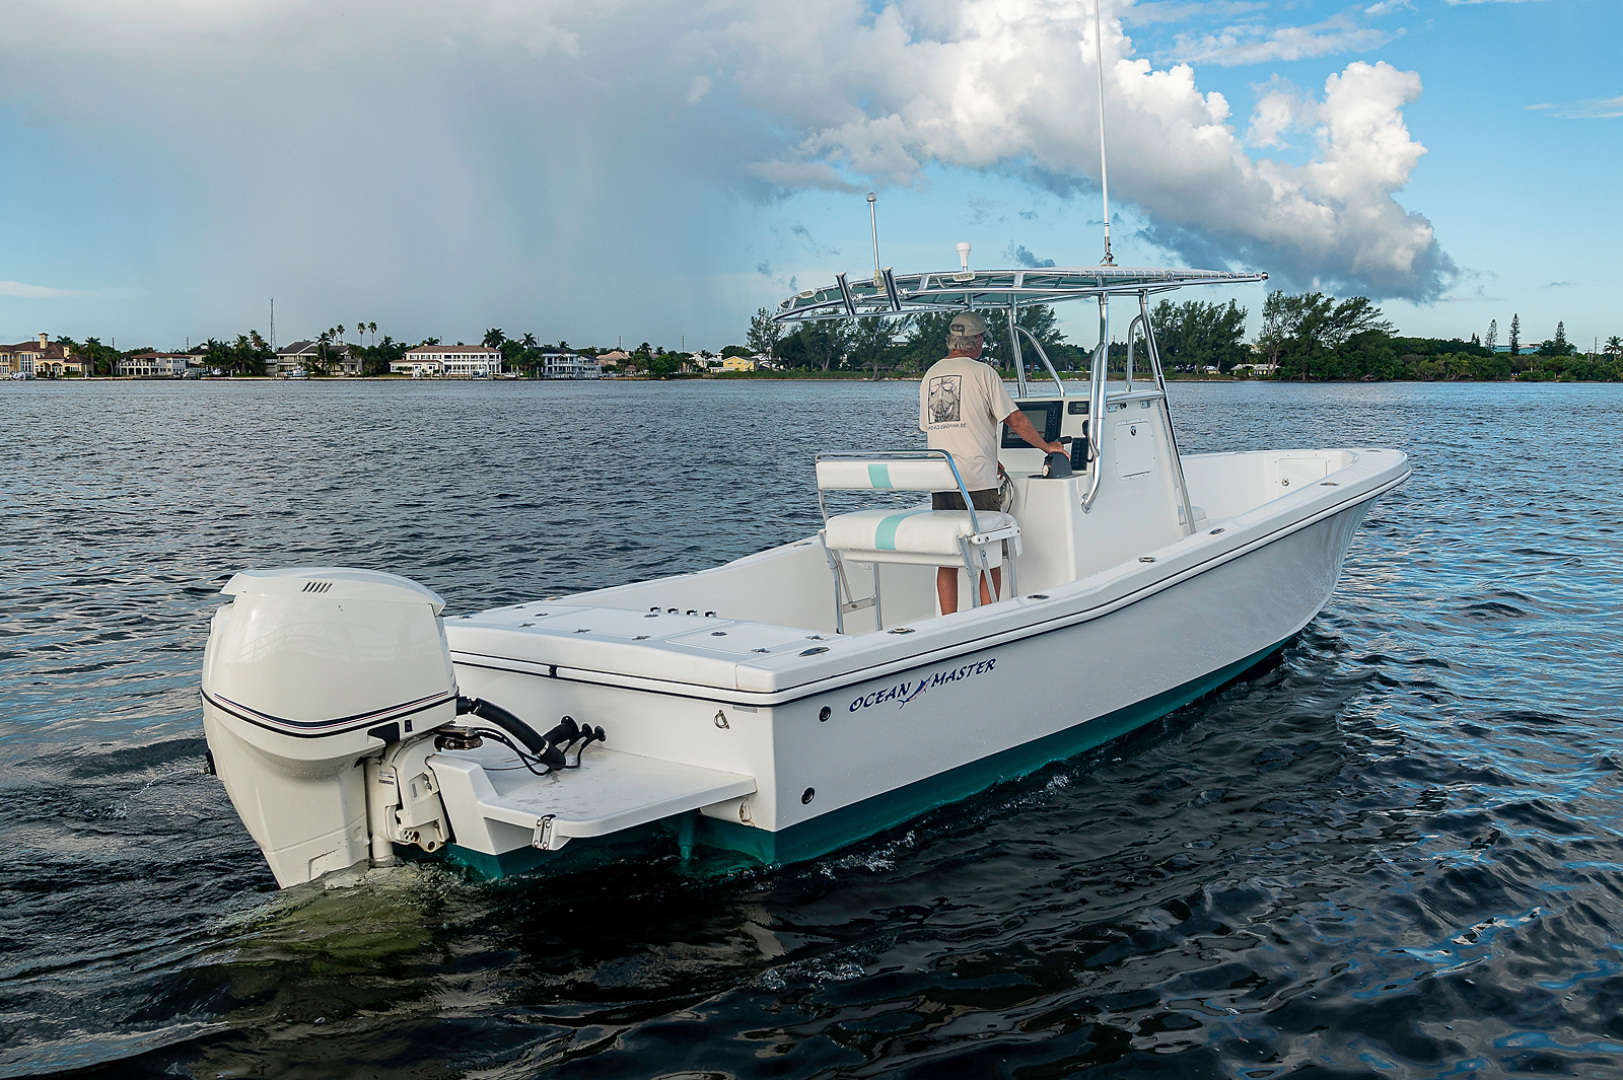 Ocean Master 2013-27 Ocean Master Palm Beach-Florida-United States-27 Ocean Master-1501377 | Thumbnail